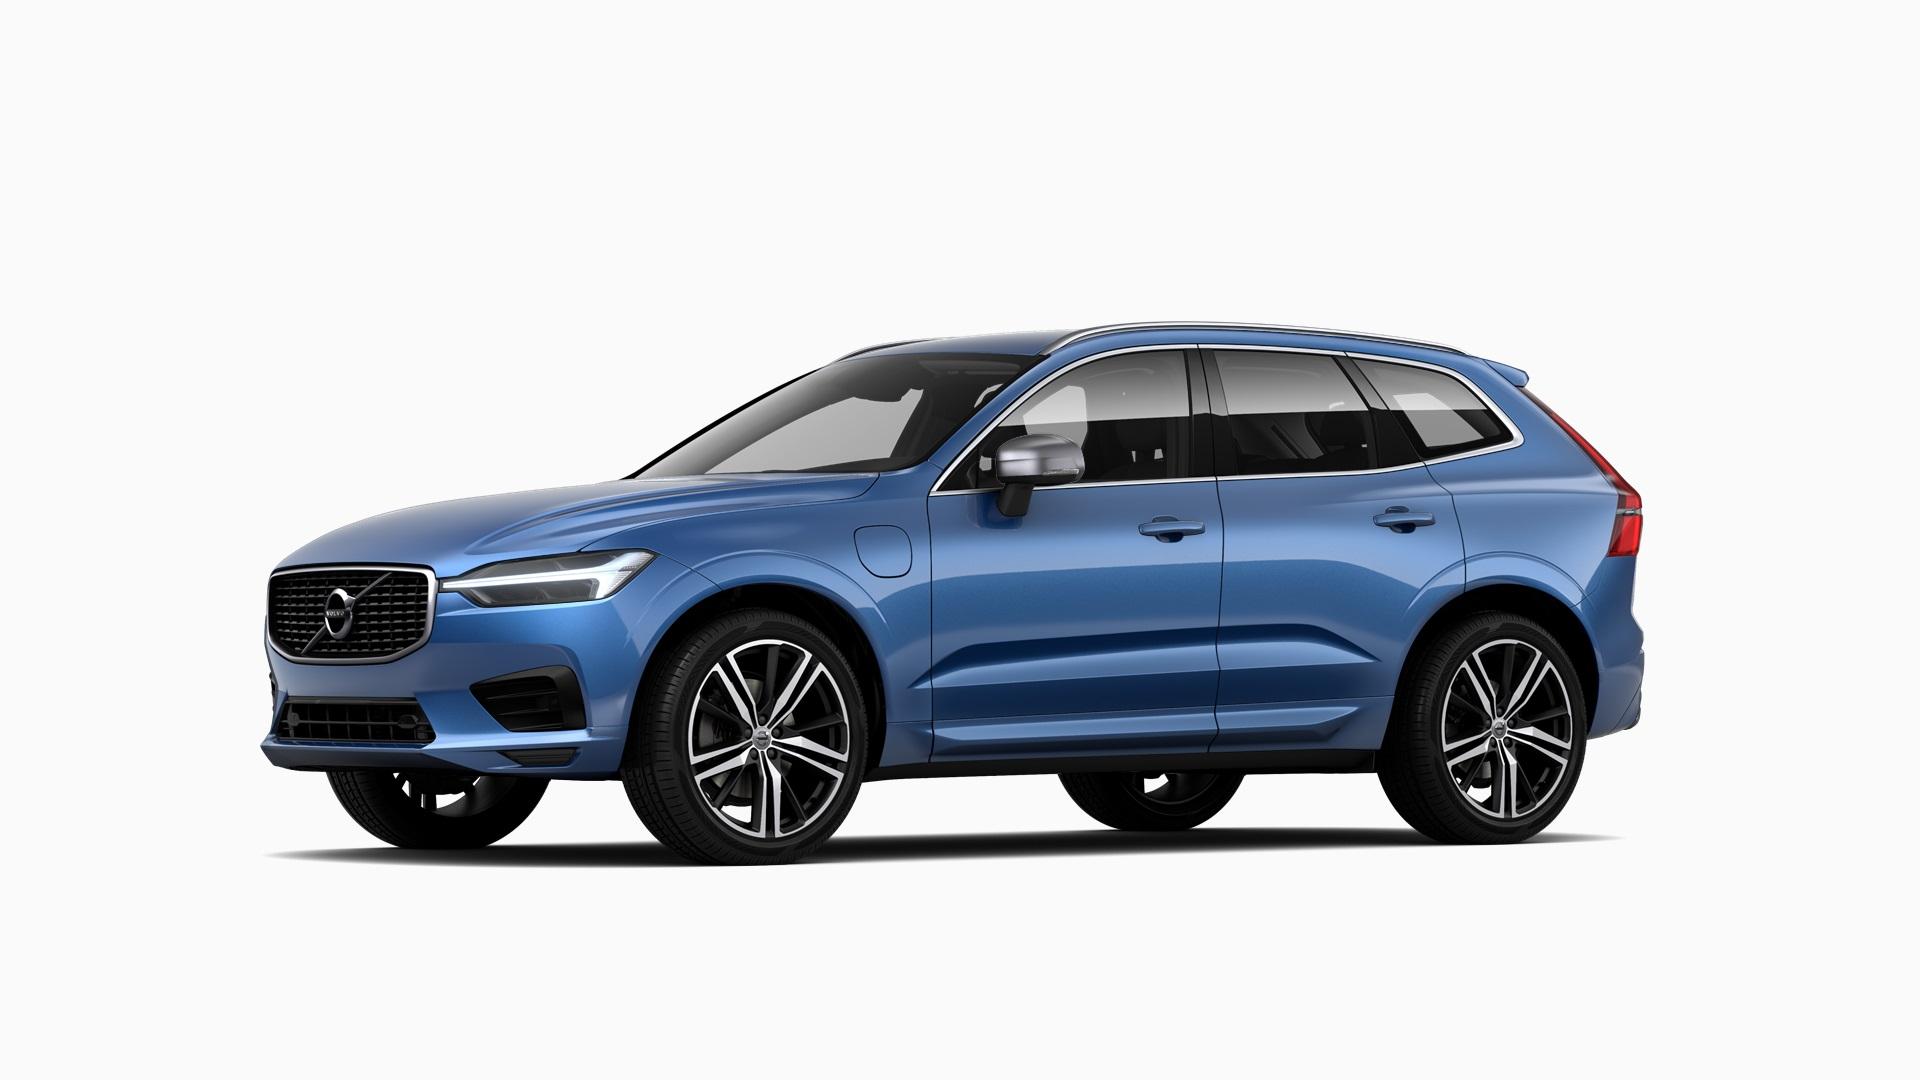 2019 Volvo Xc60 T8 Twin Engine Eawd R Design 1803659